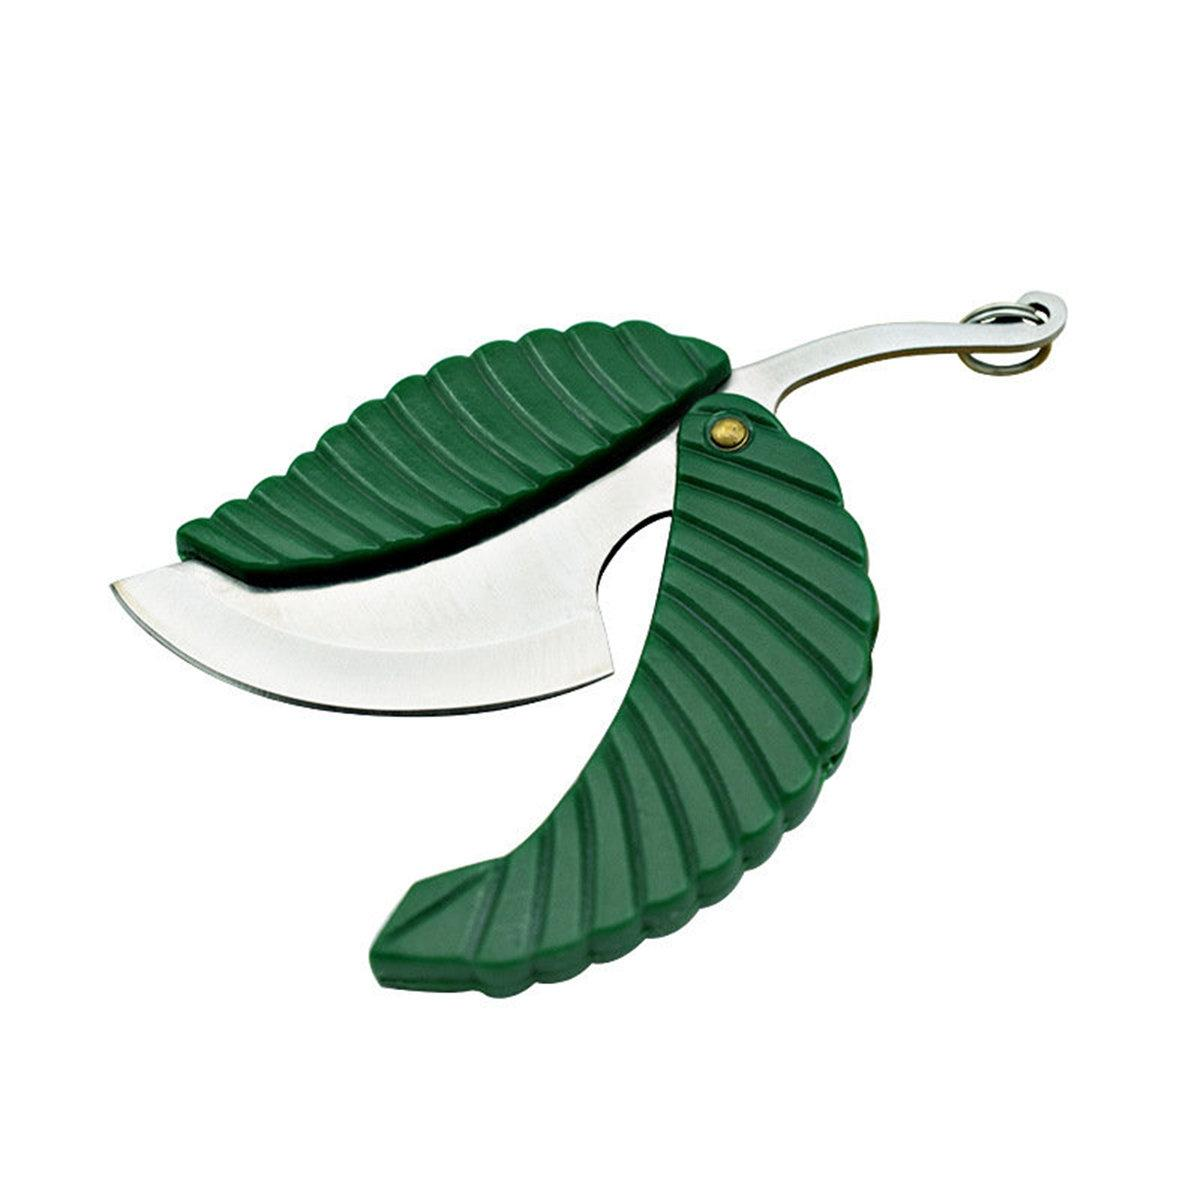 Grünes Mini-Falten-Taschenmesser Blattform Styling Schlüsselanhänger Messer Outdoor Camp Fruchtmesser Camping Wandern Survival Tool GWF7815